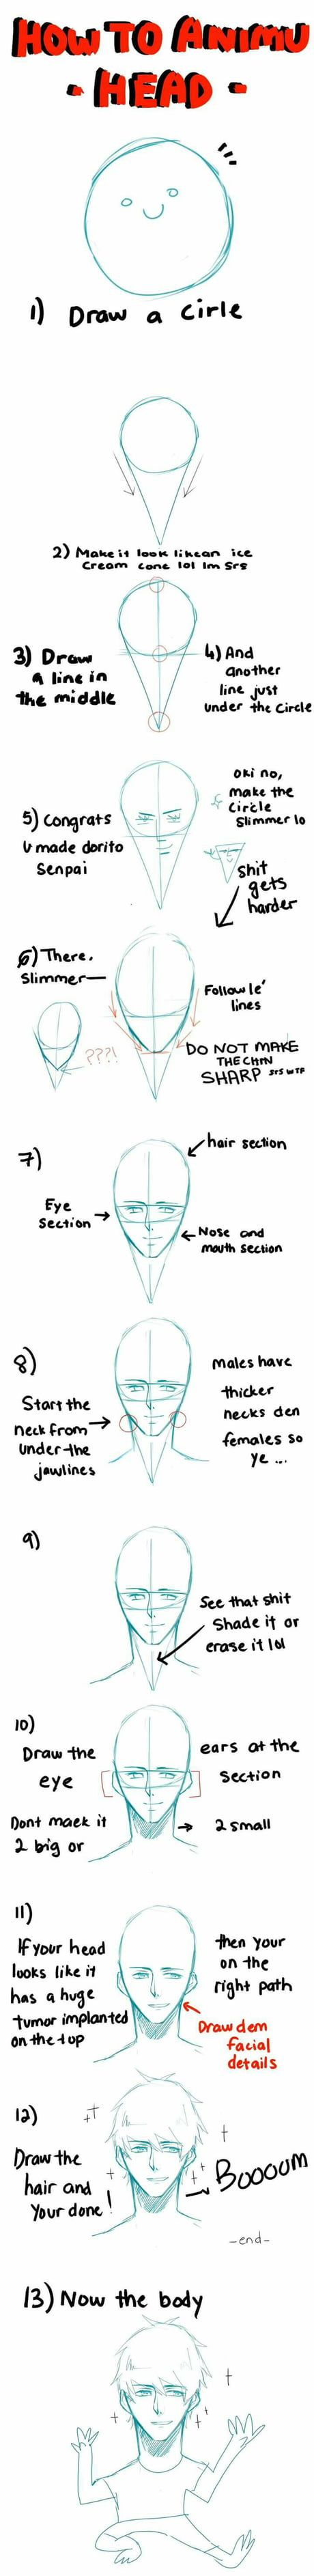 How To Draw Anime Anime Drawings Drawing Tips Manga Drawing